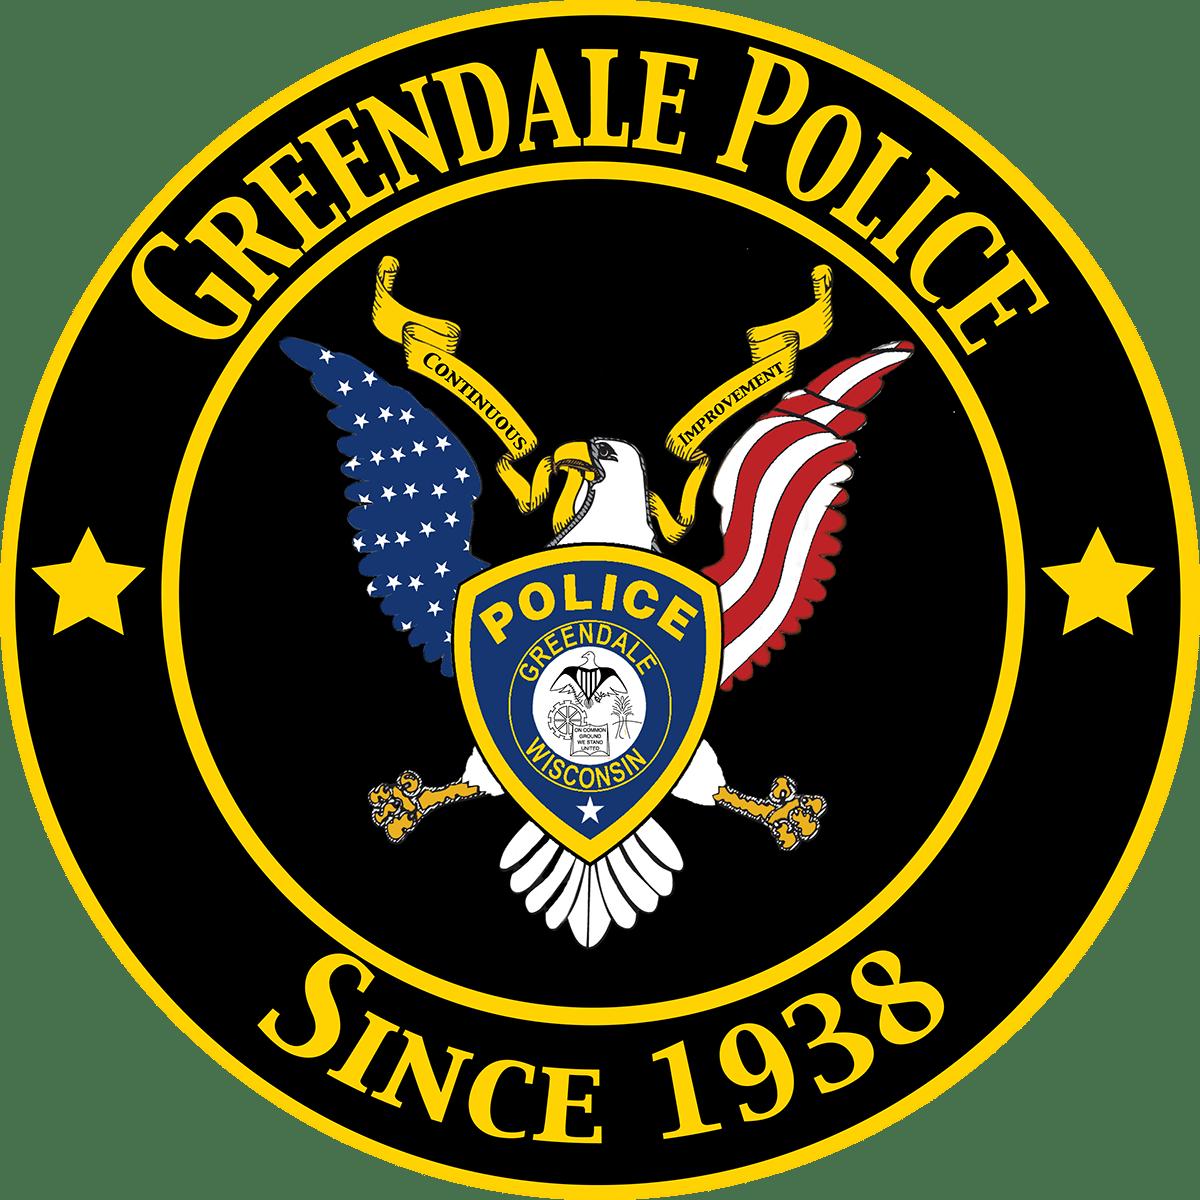 logo nganh cong an greendale